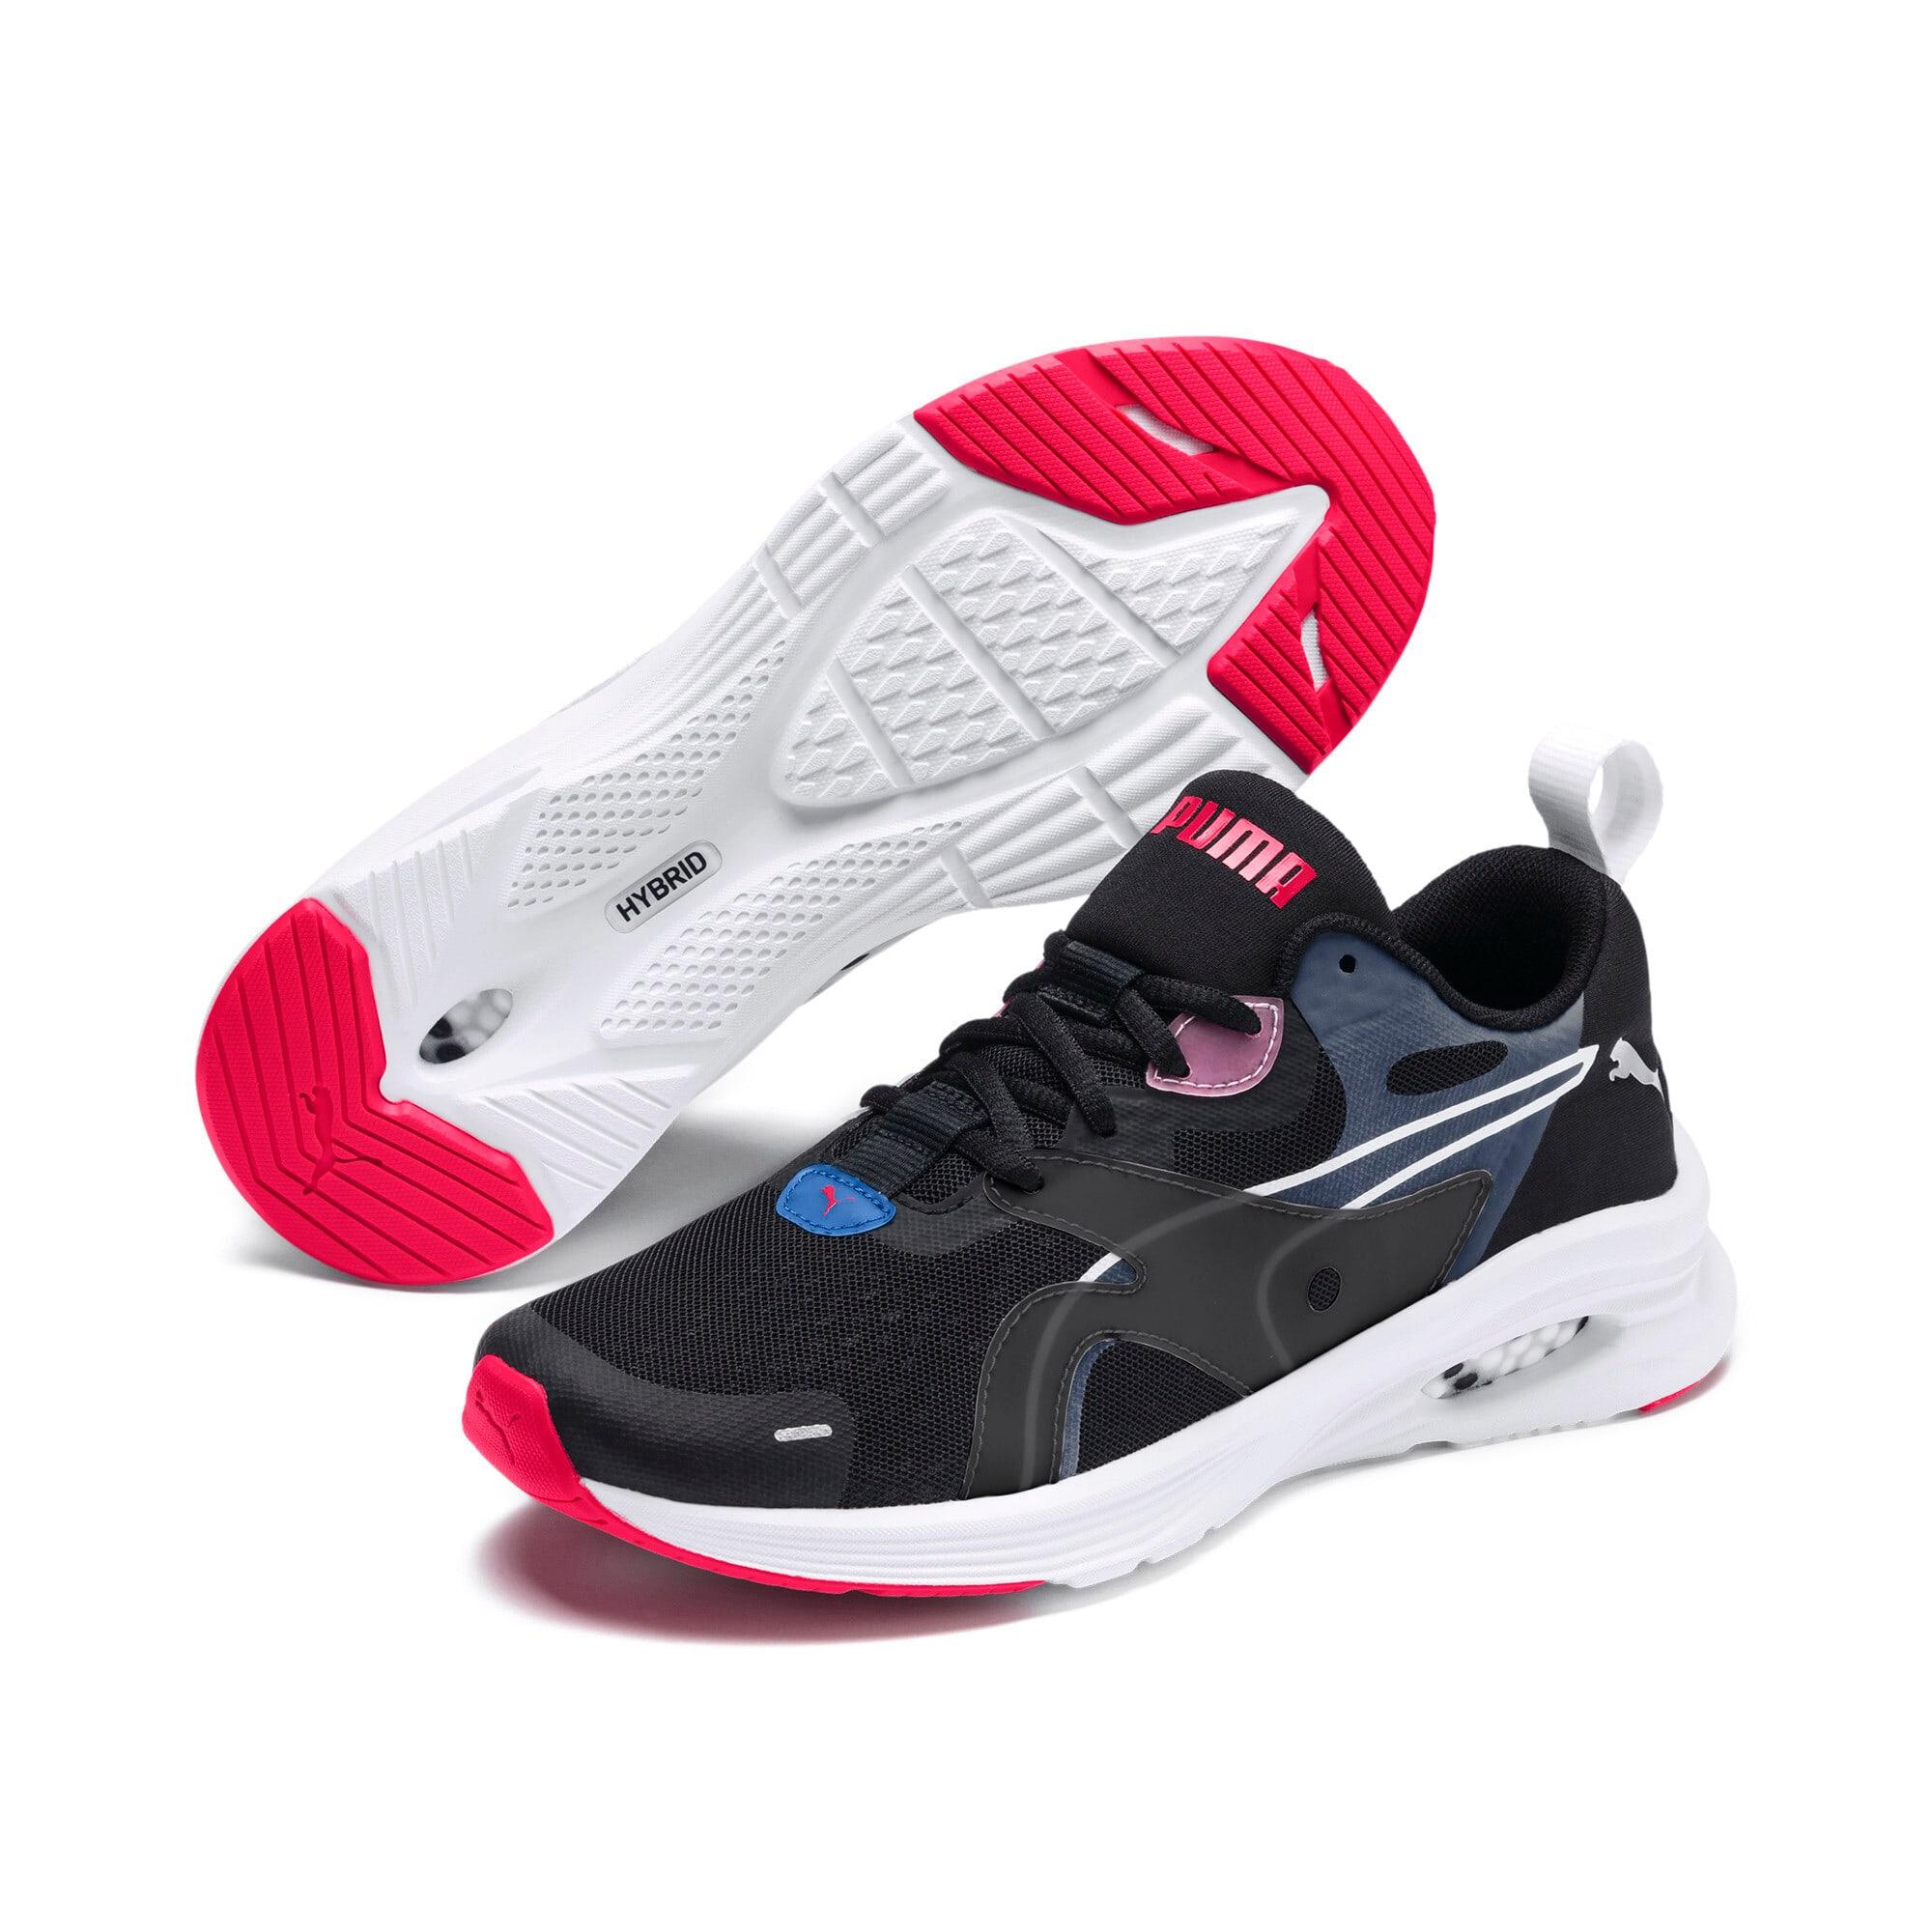 Thumbnail 3 of HYBRID Fuego Women's Running Shoes, Black-Blue Glimmer-Nrgy Rose, medium